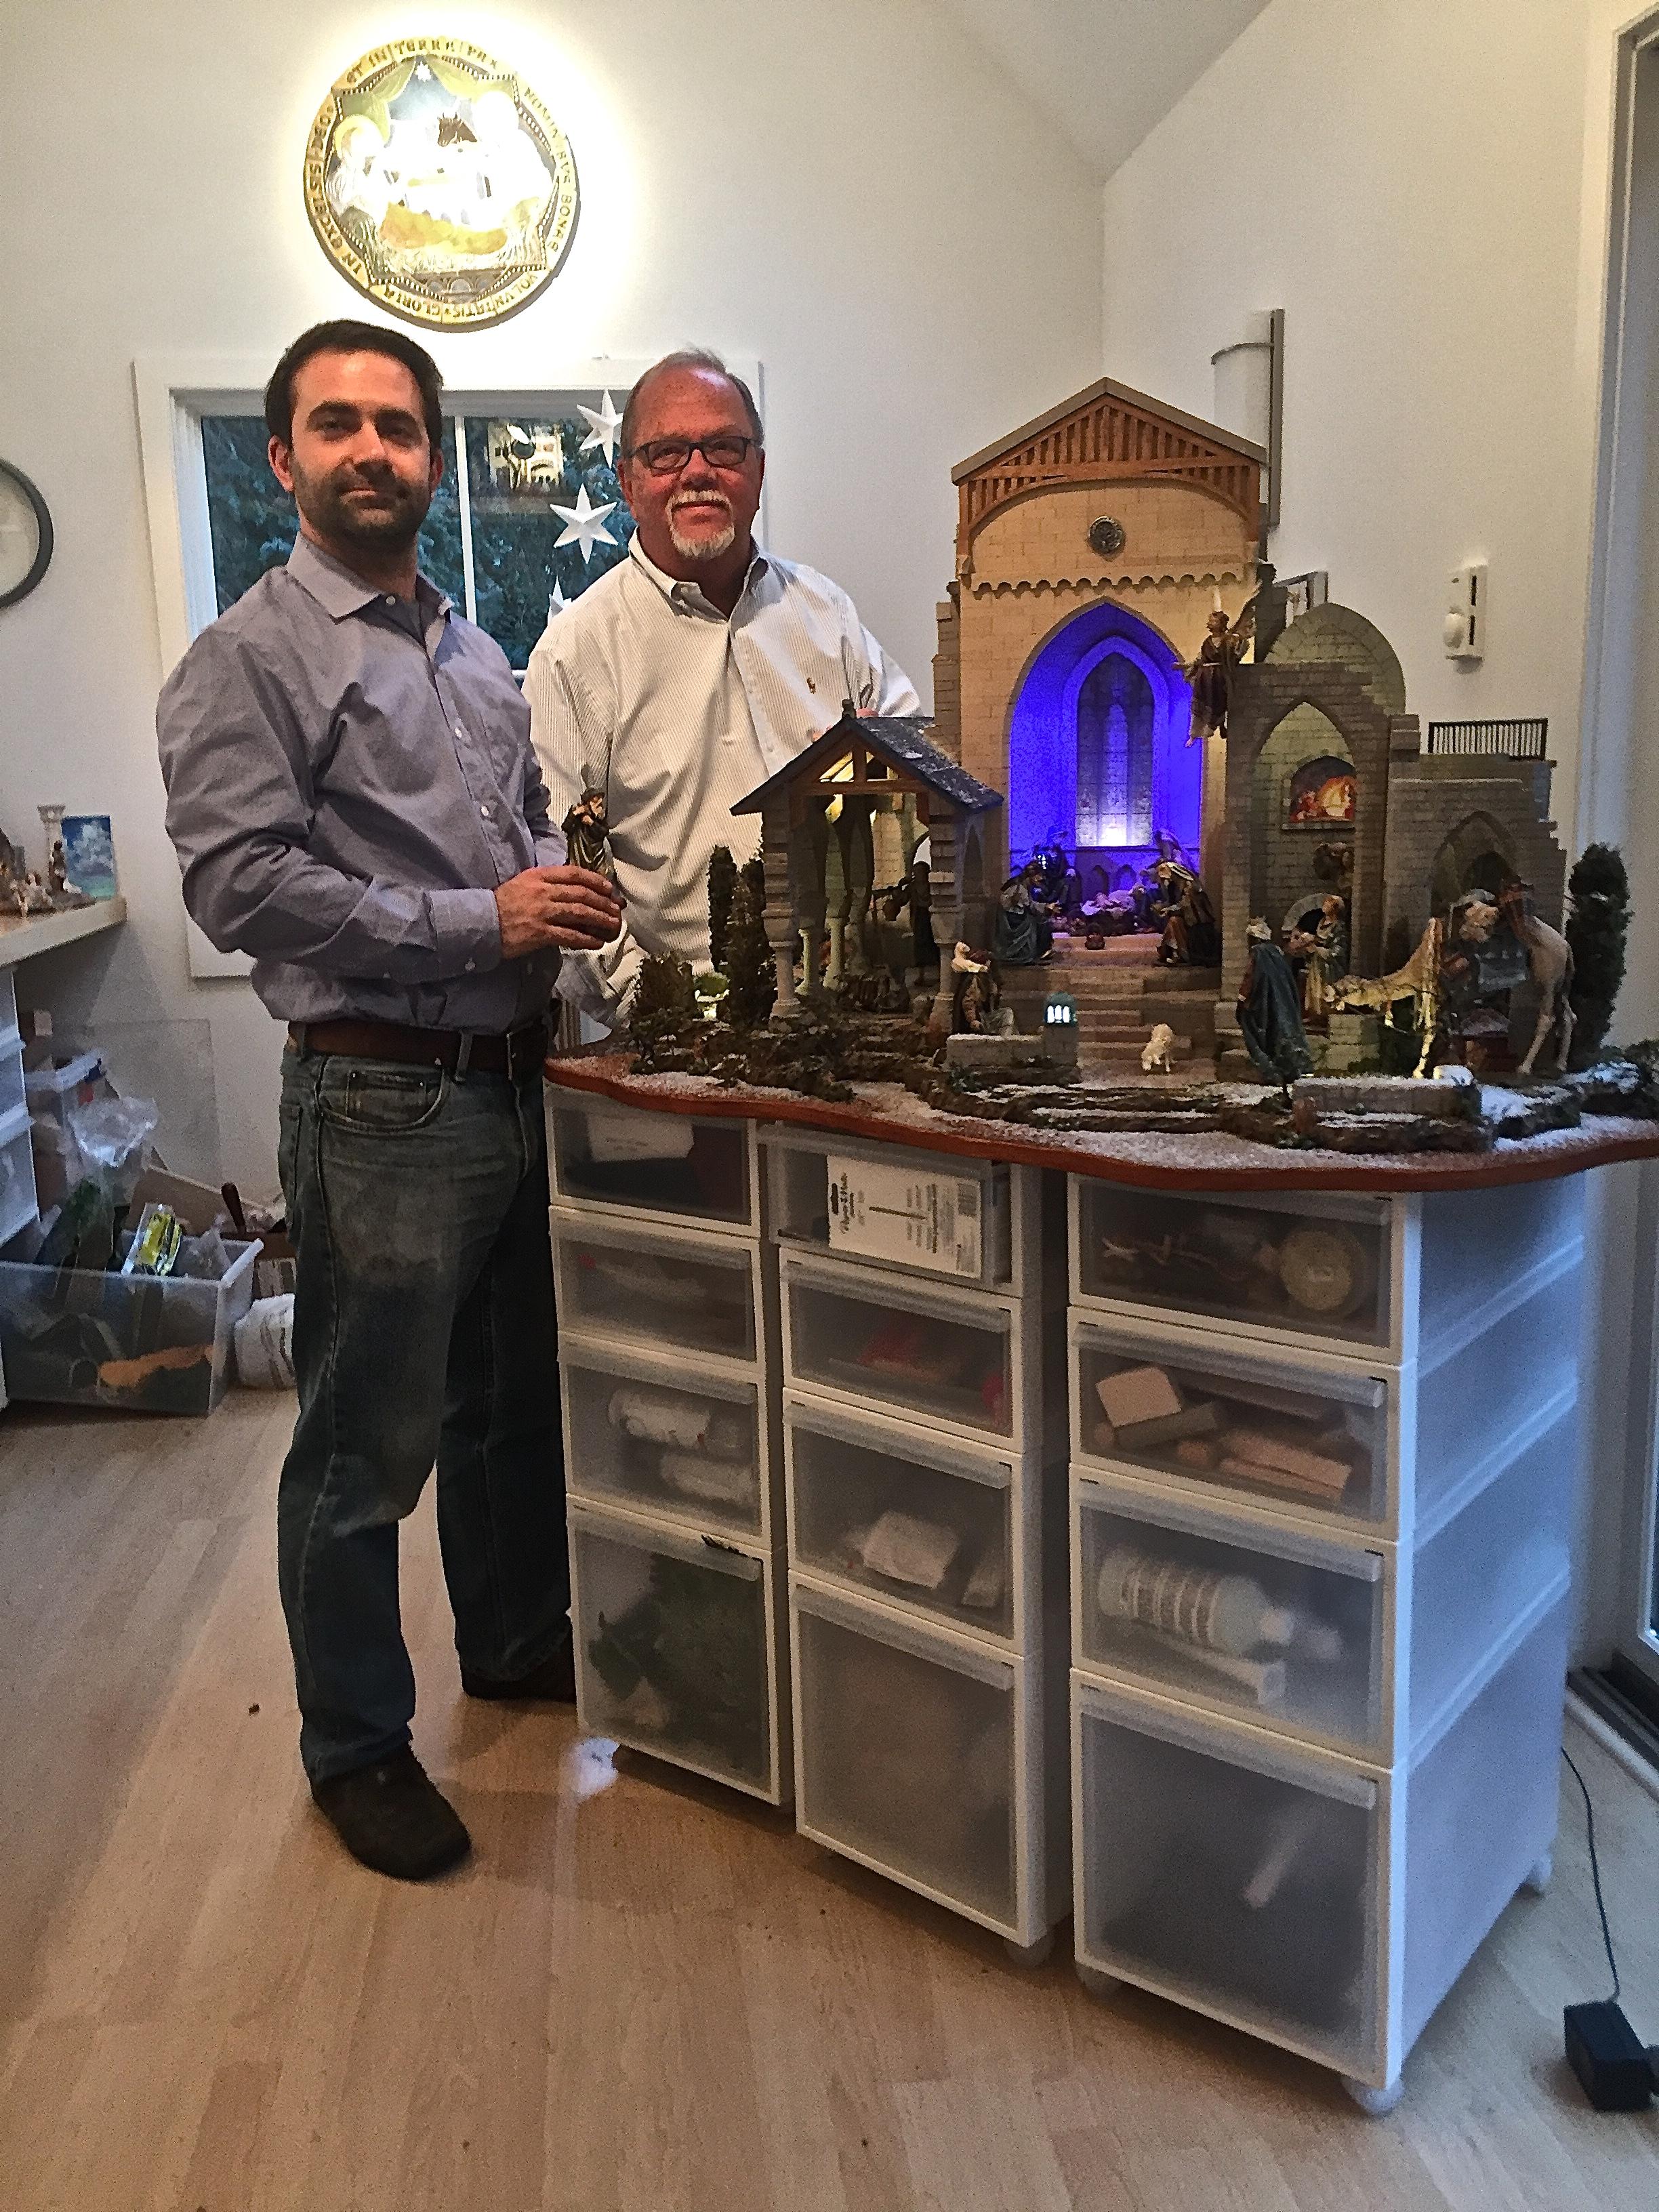 A.J. DiAntonio & Michael Stumpf